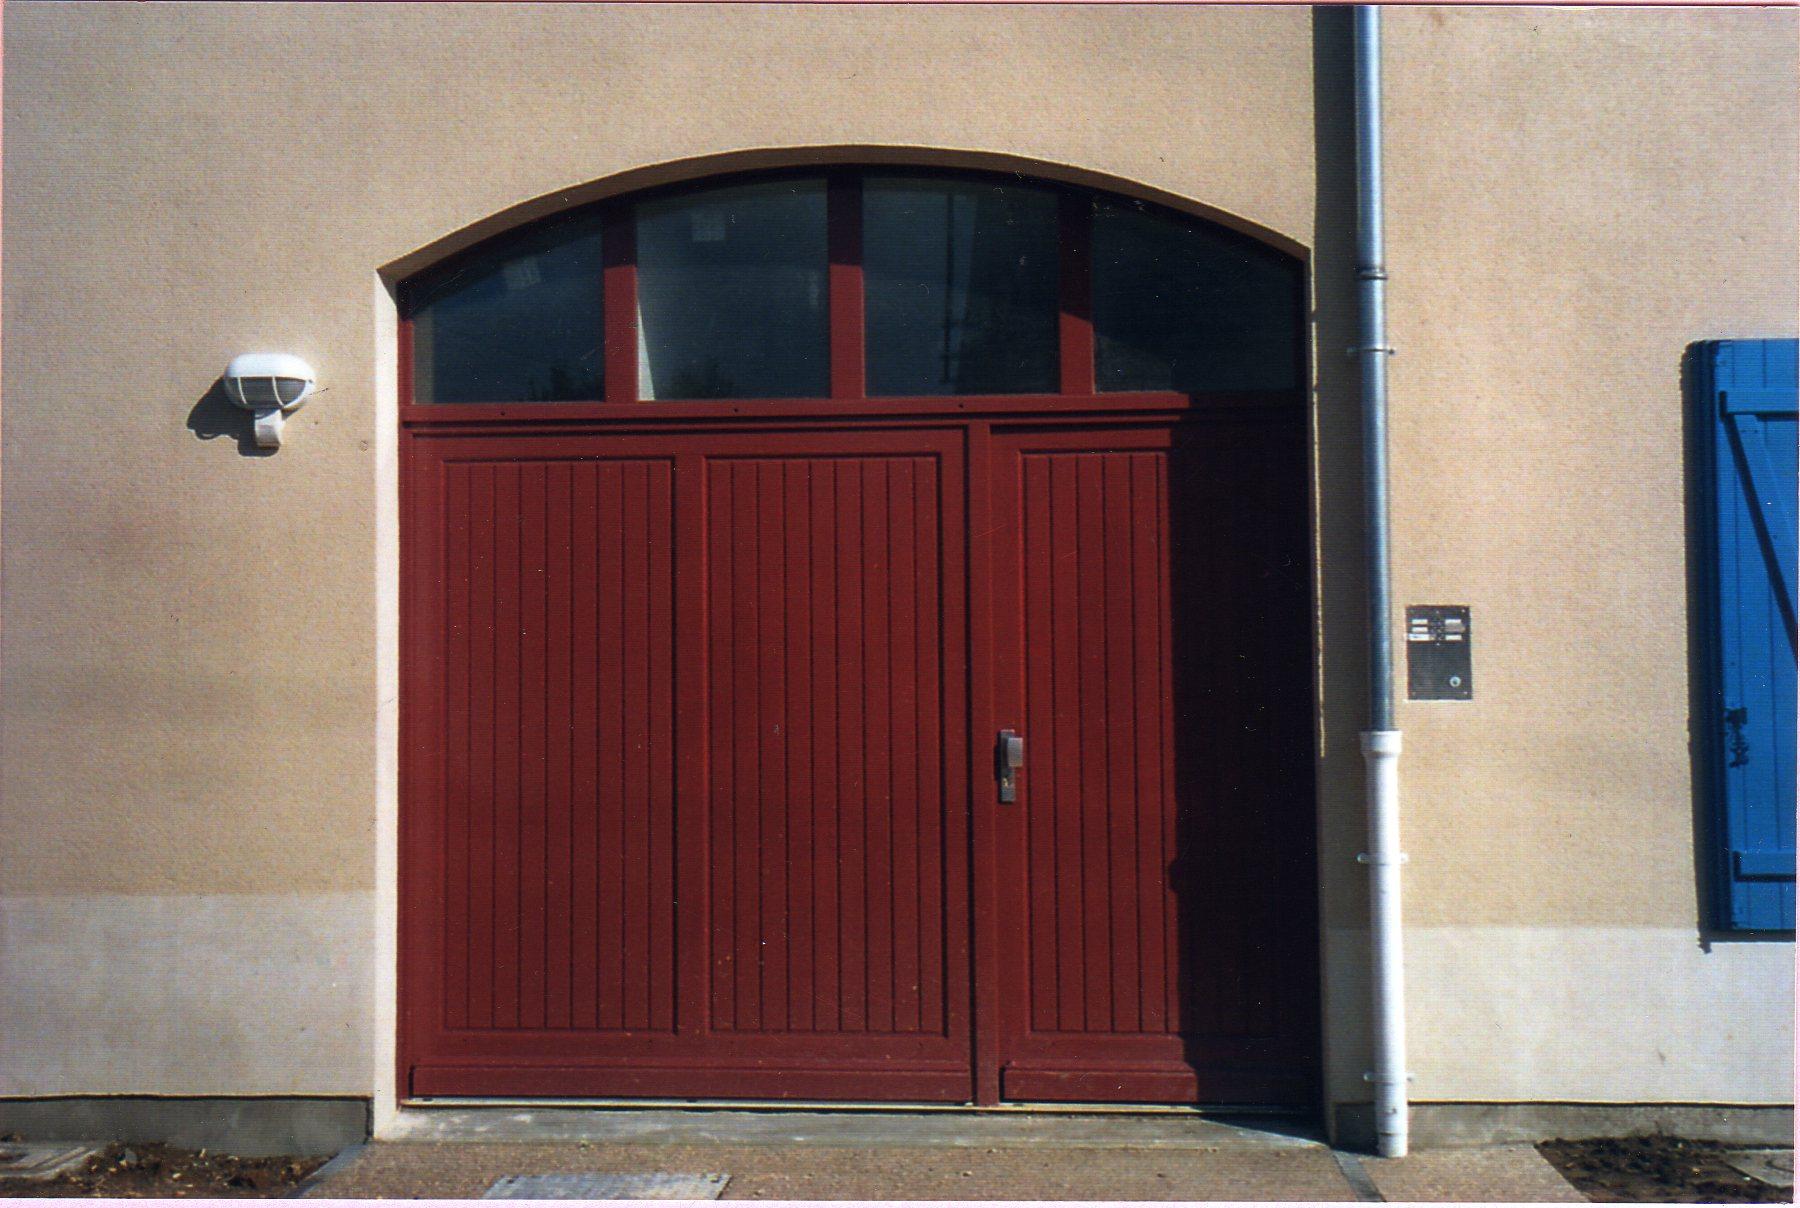 Menuiserie sarl beaun lamouret - Porte de garage 4m ...